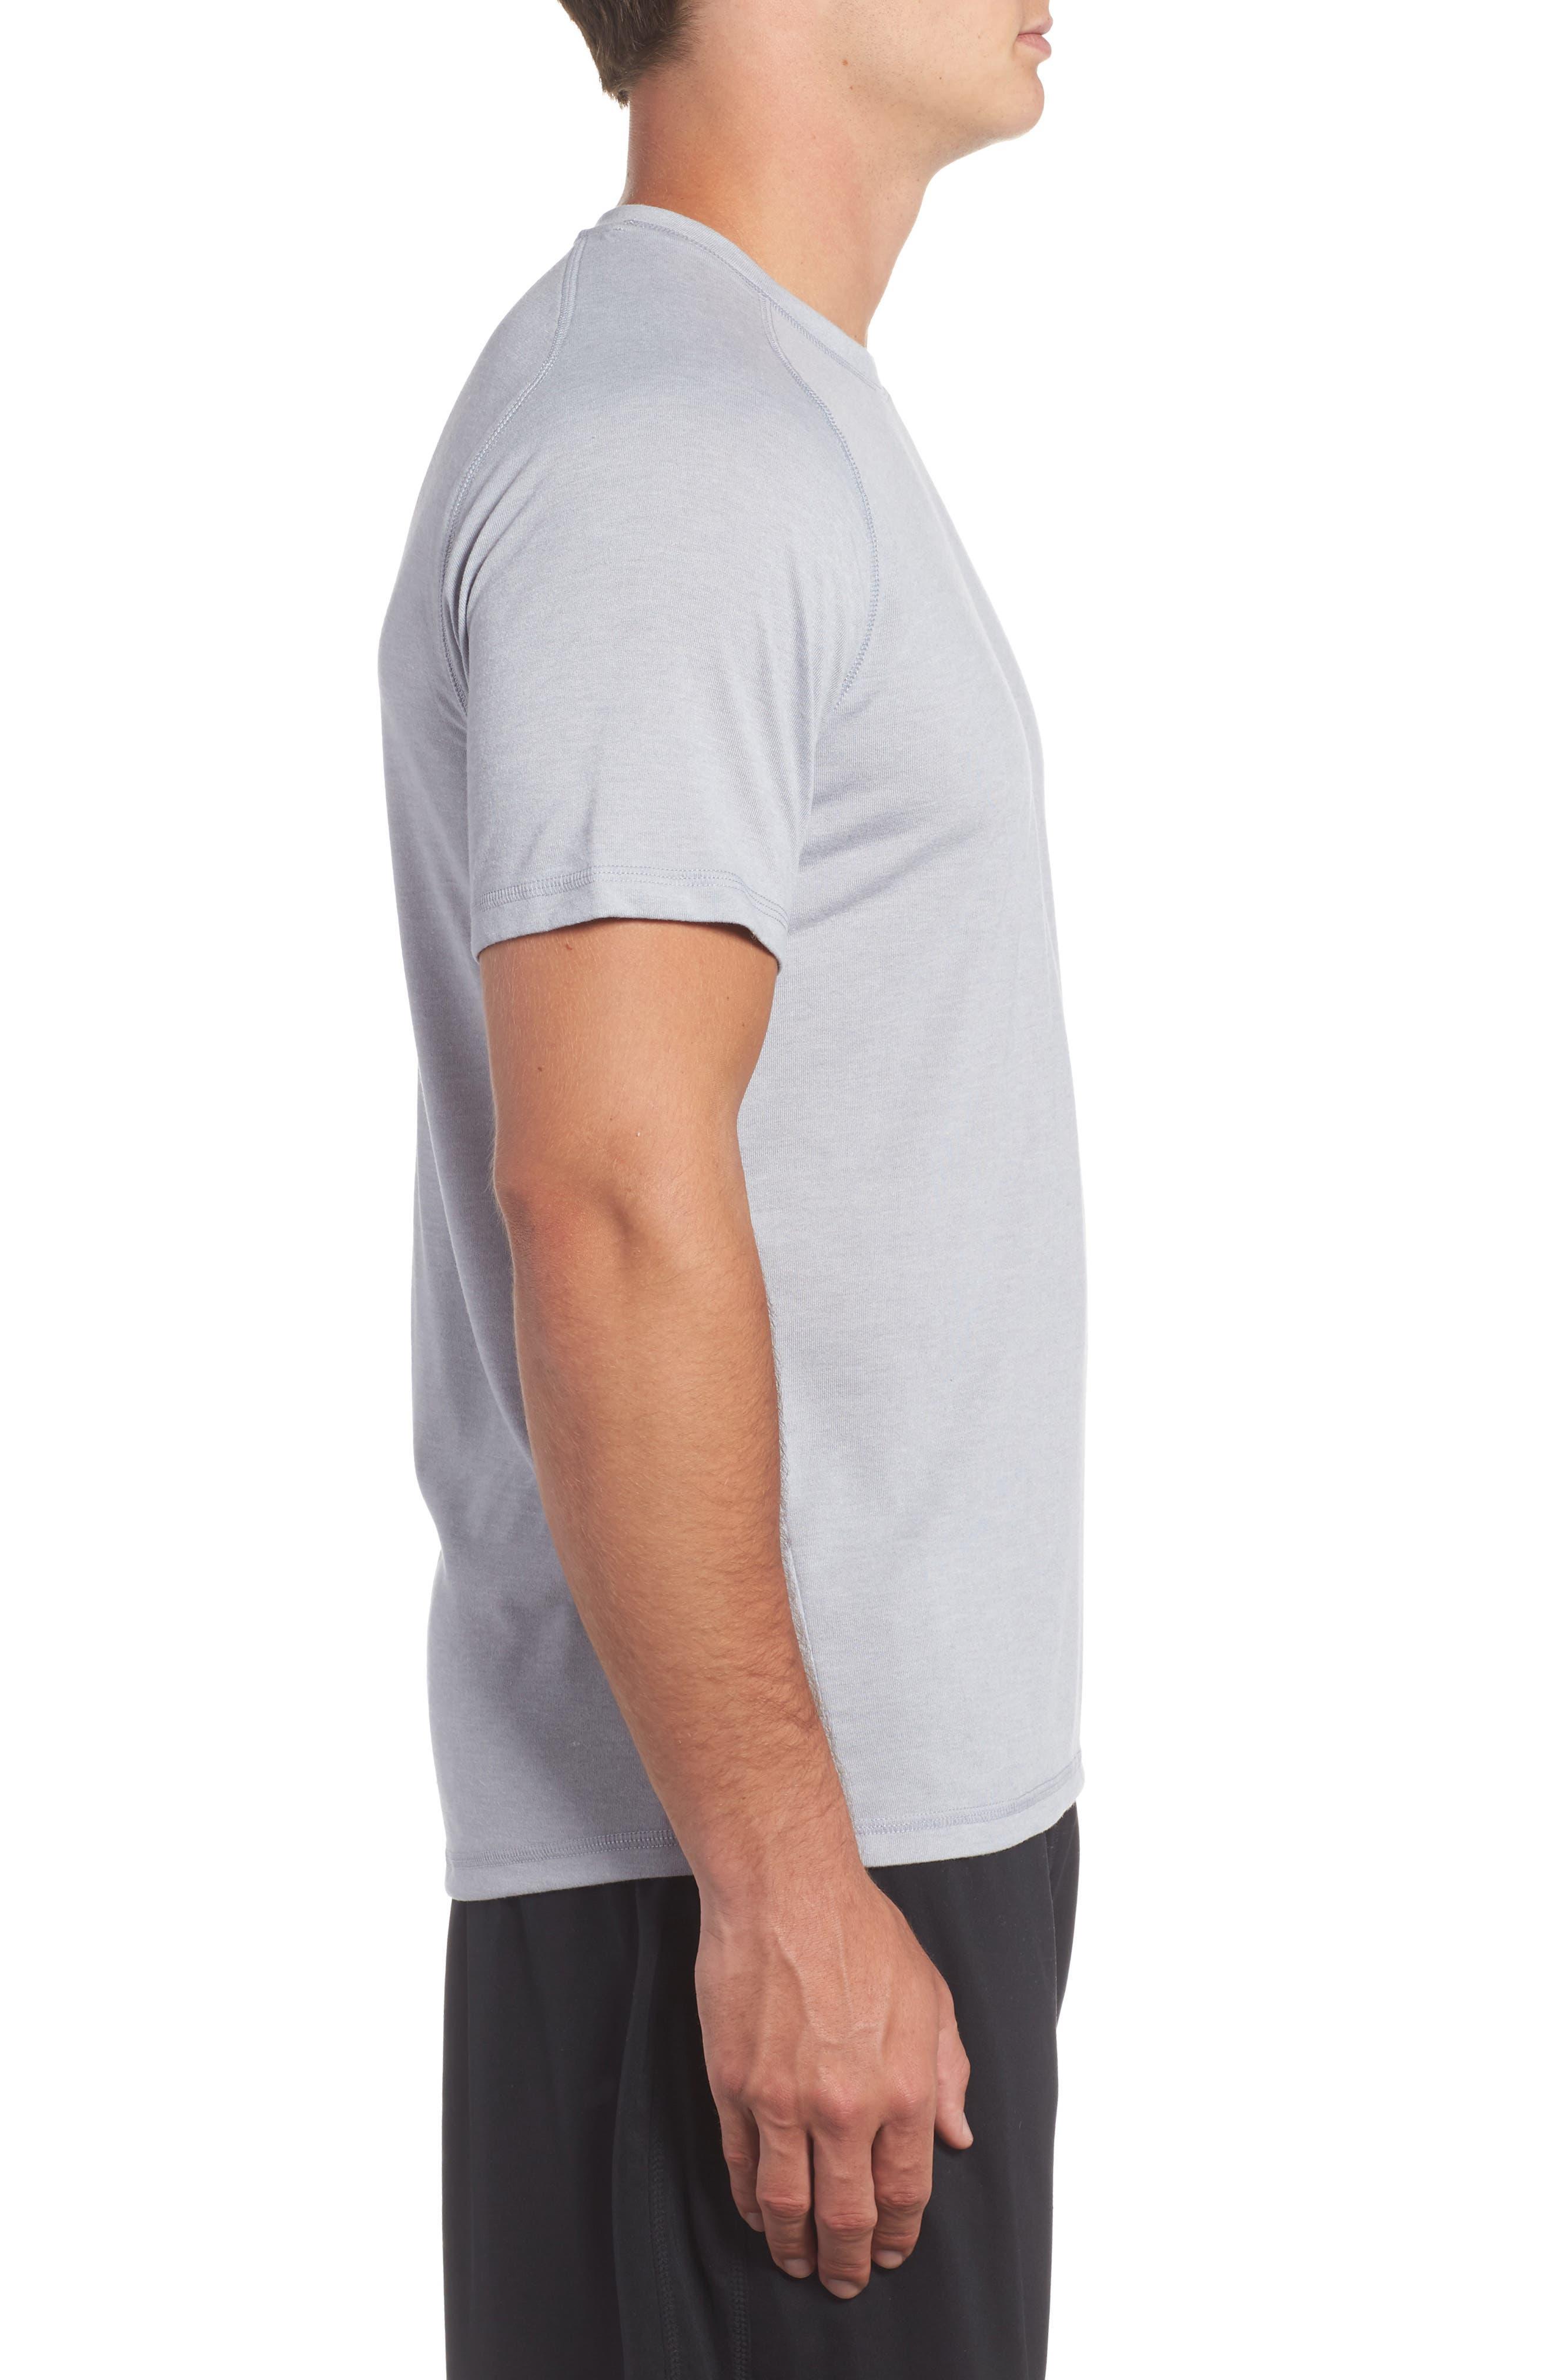 Celsian Training T-Shirt,                             Alternate thumbnail 3, color,                             050